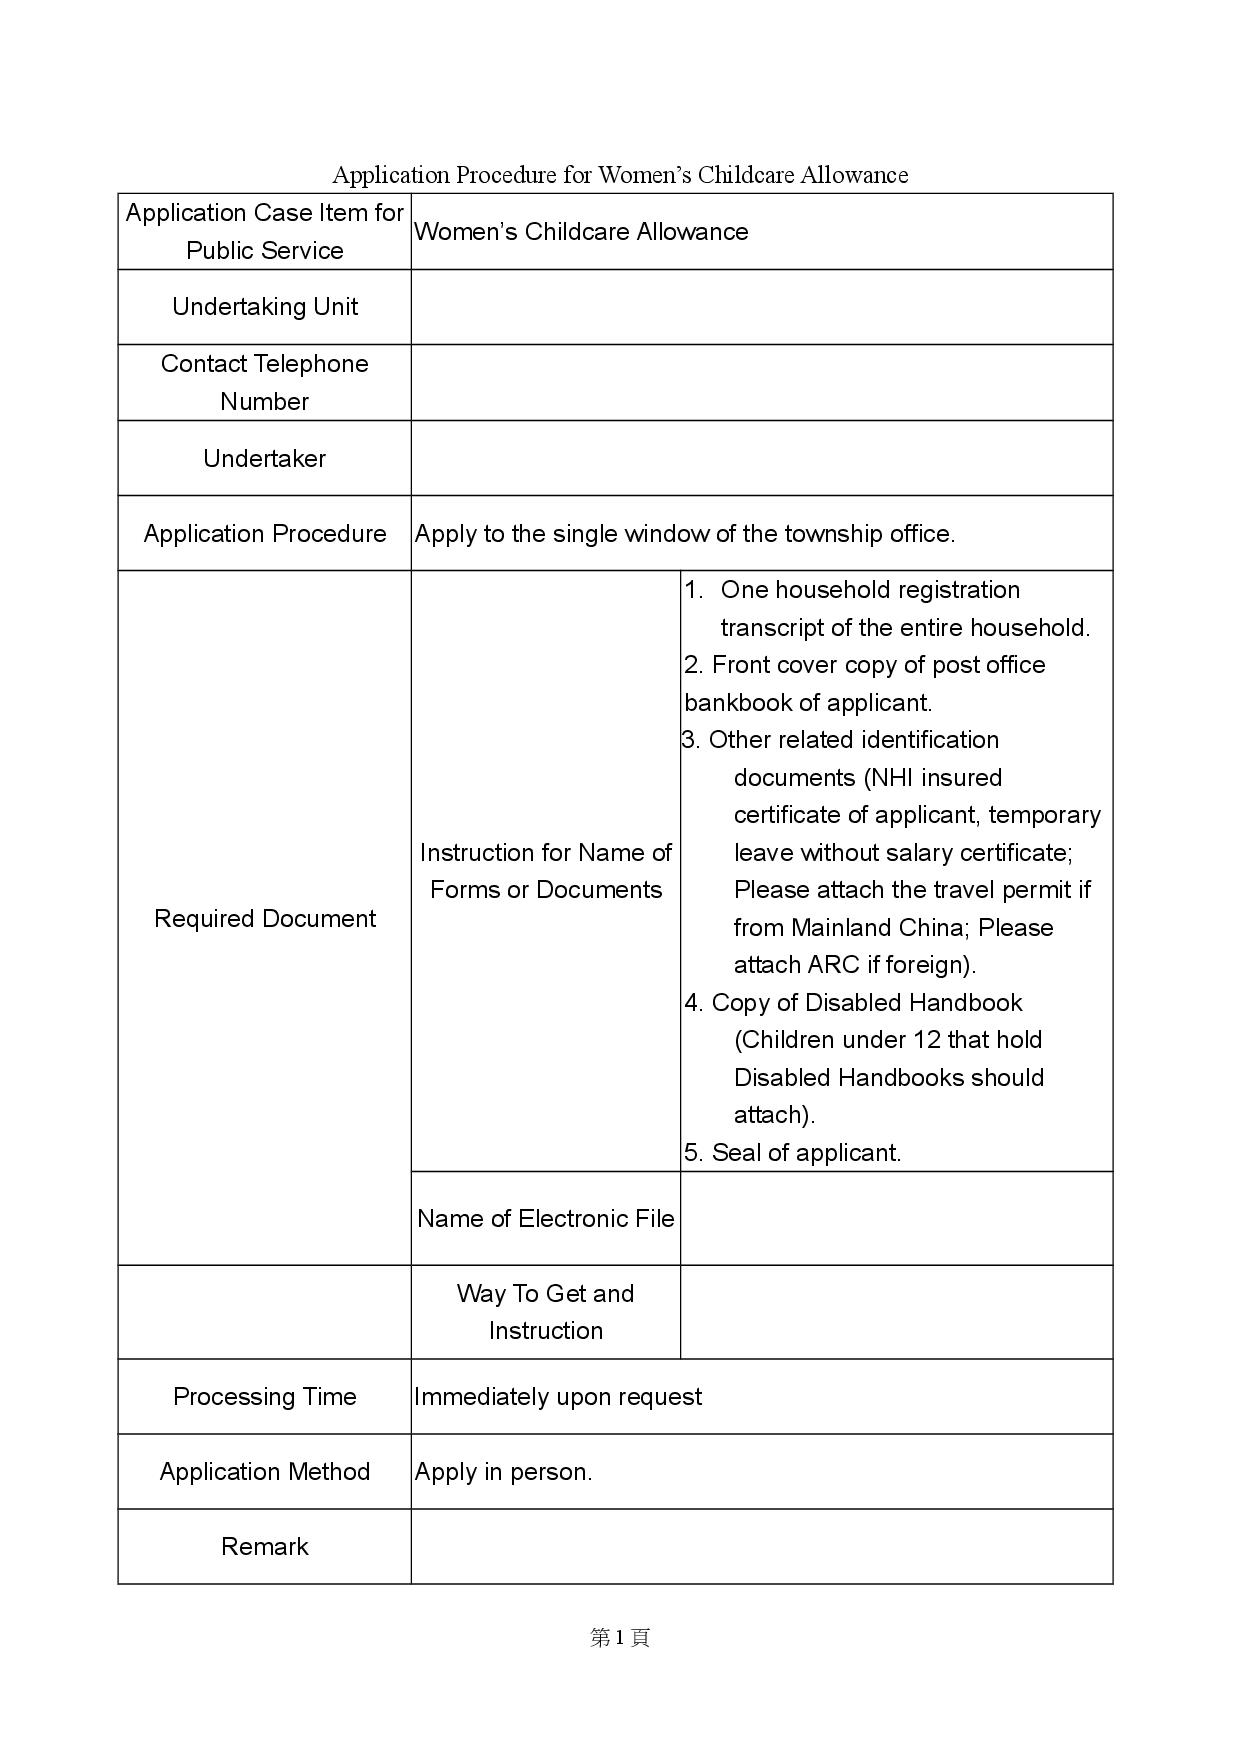 Application Procedure for Women's Childcare Allowance